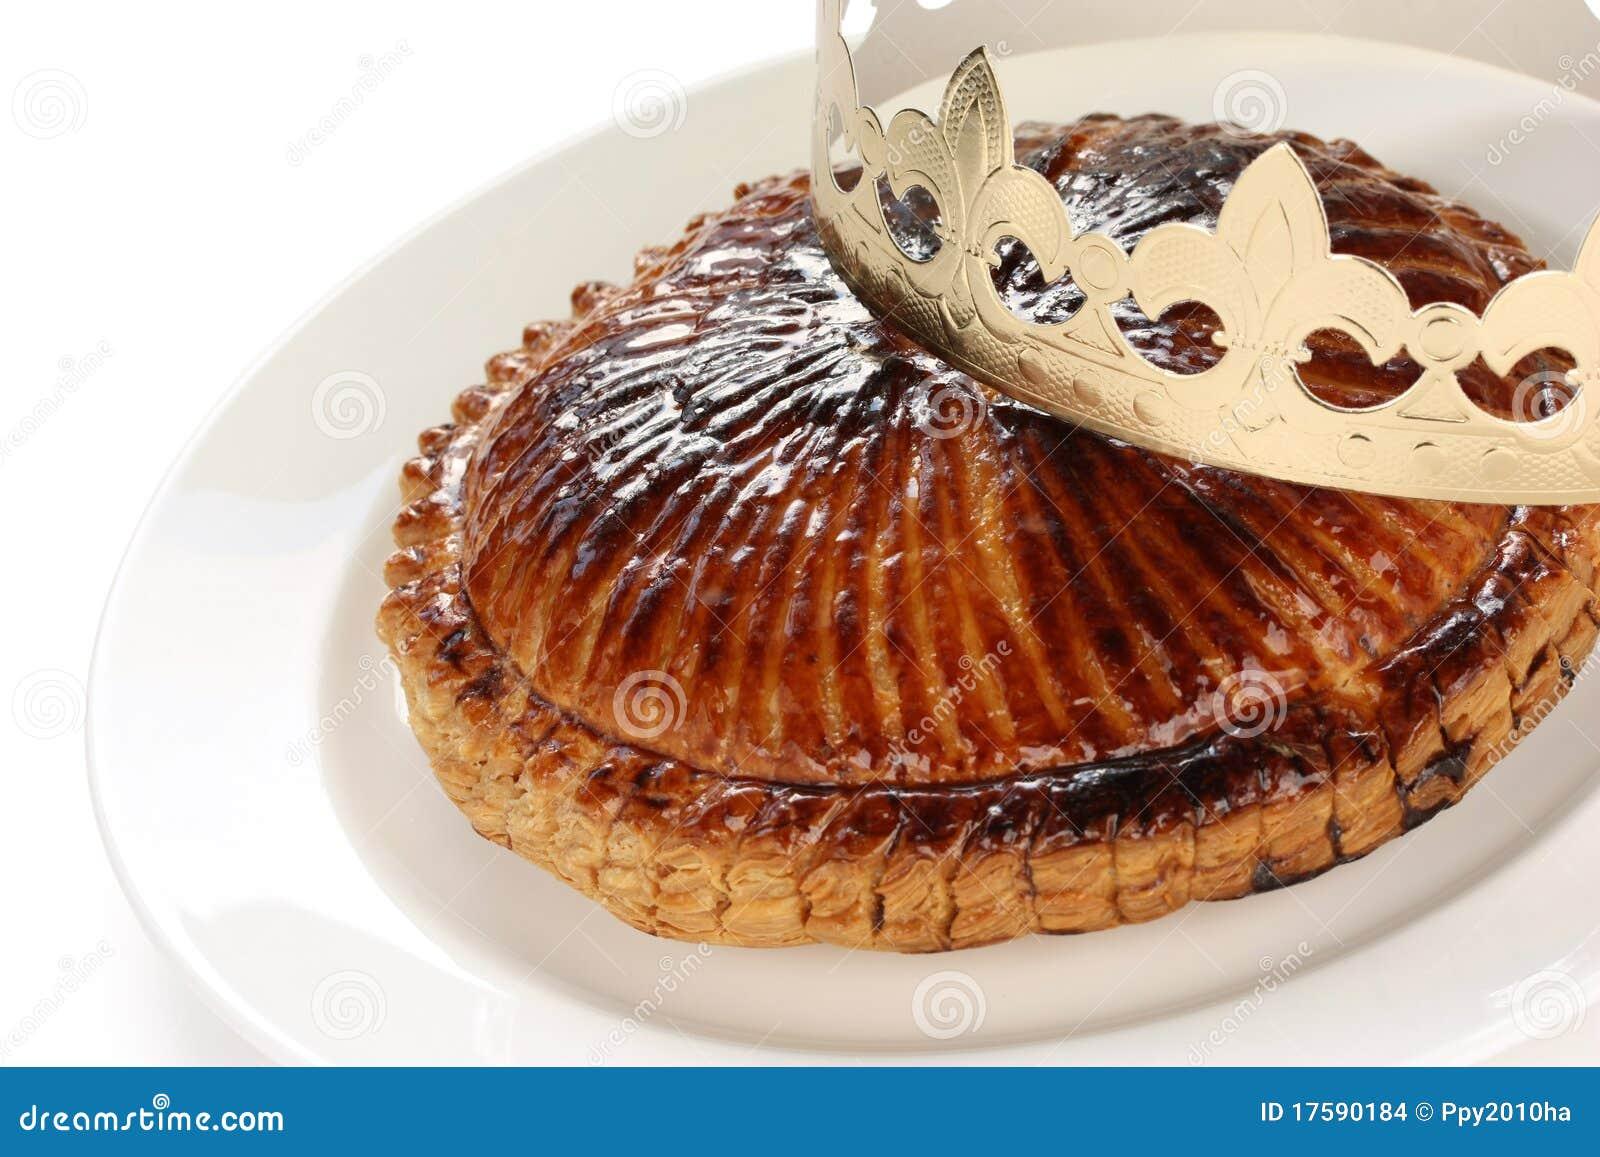 Galette des rois king cake stock photo image 17590184 - Galette des rois image ...